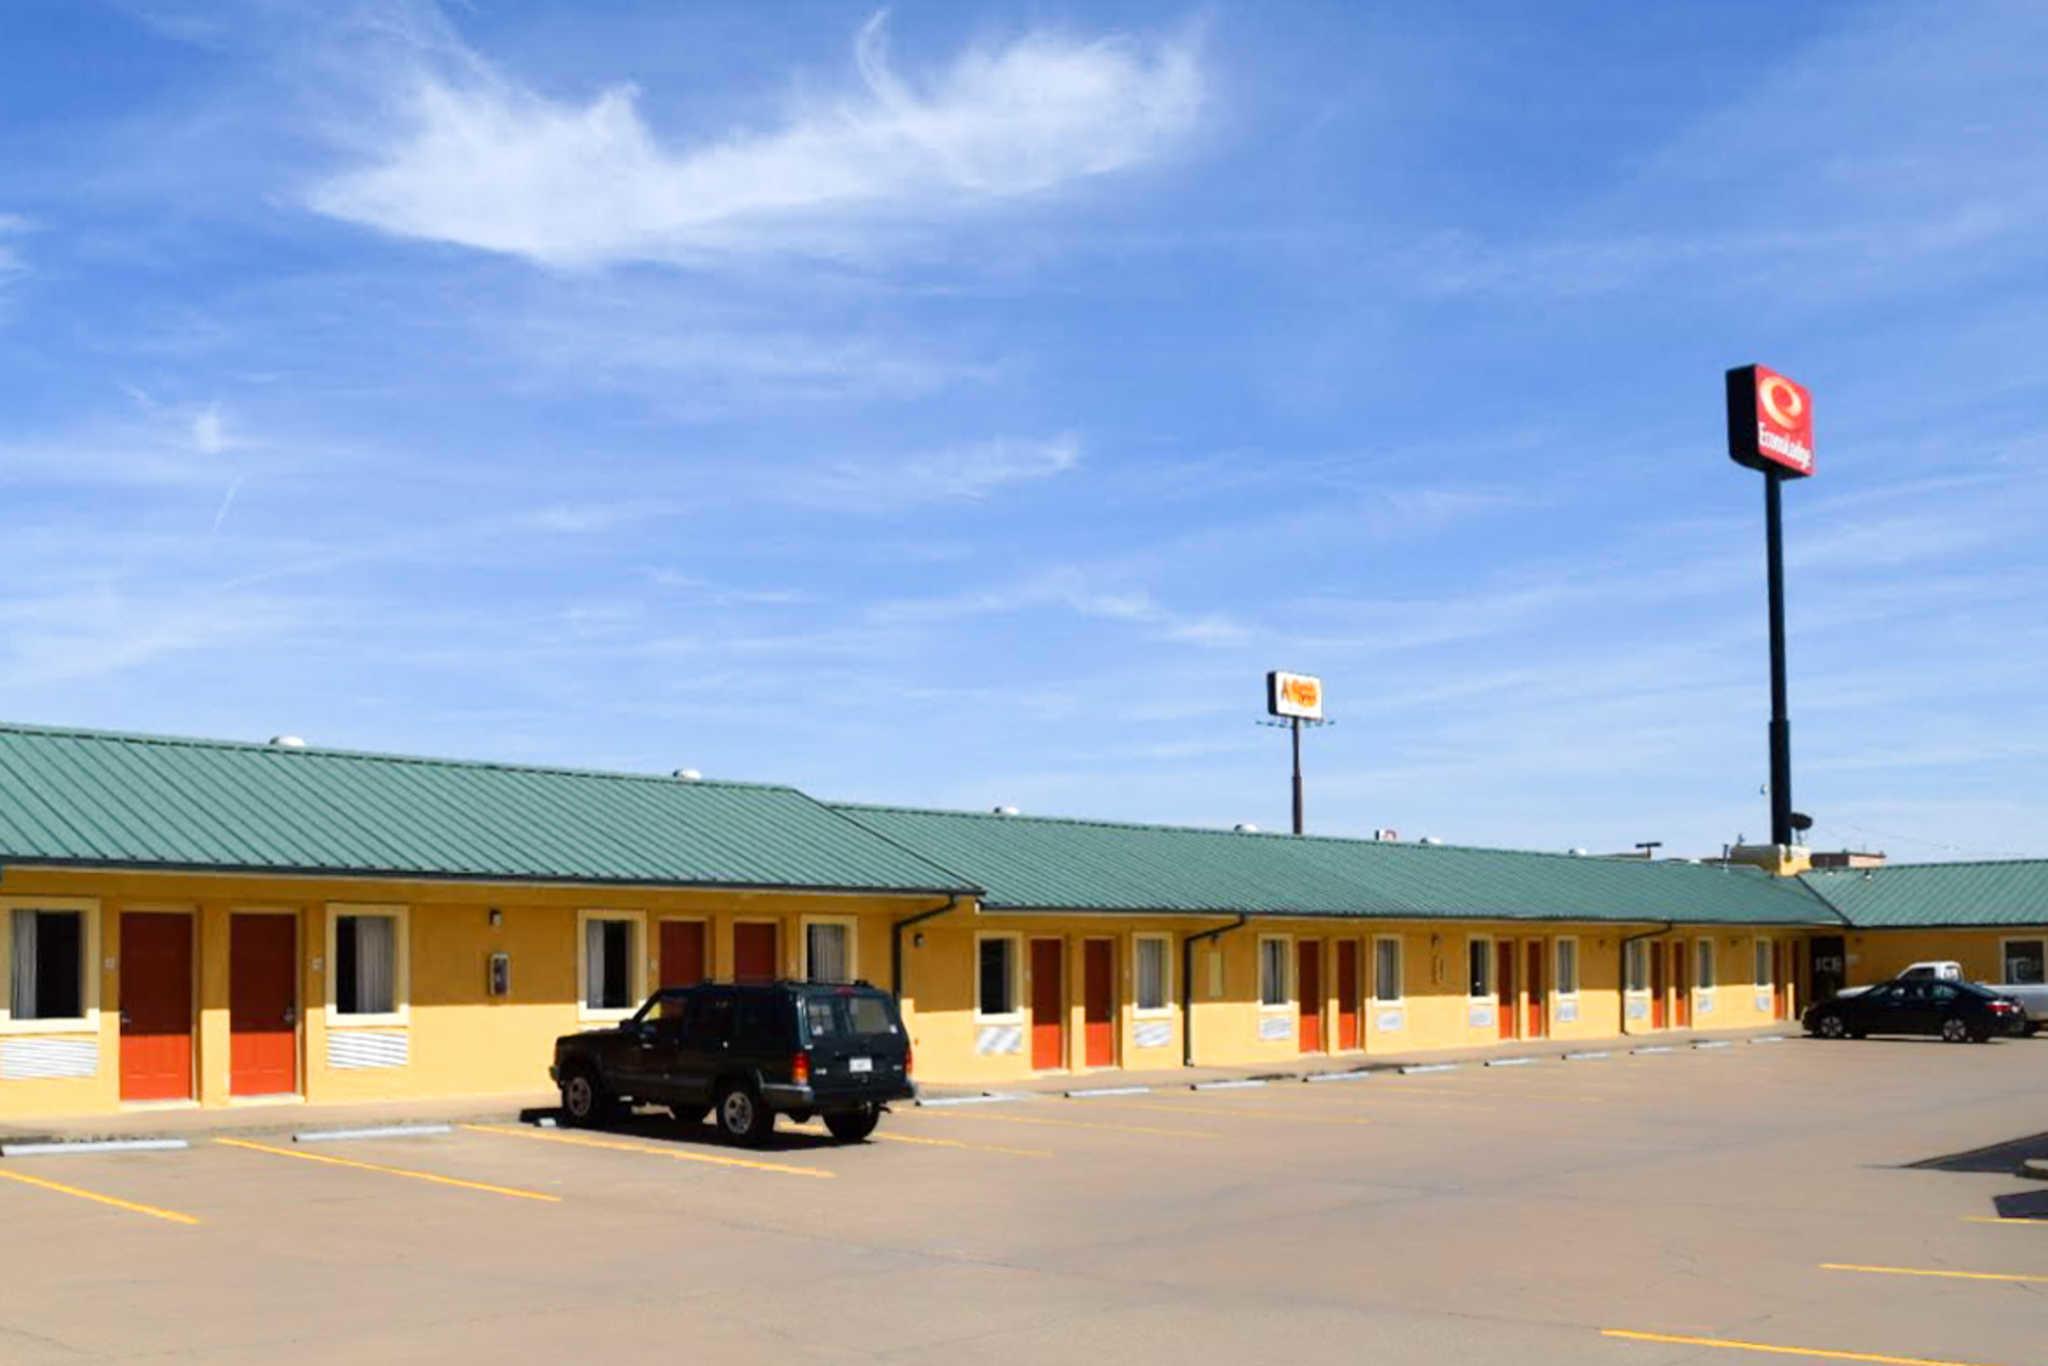 Econo Lodge In Jonesboro Ar 72401 Chamberofcommerce Com